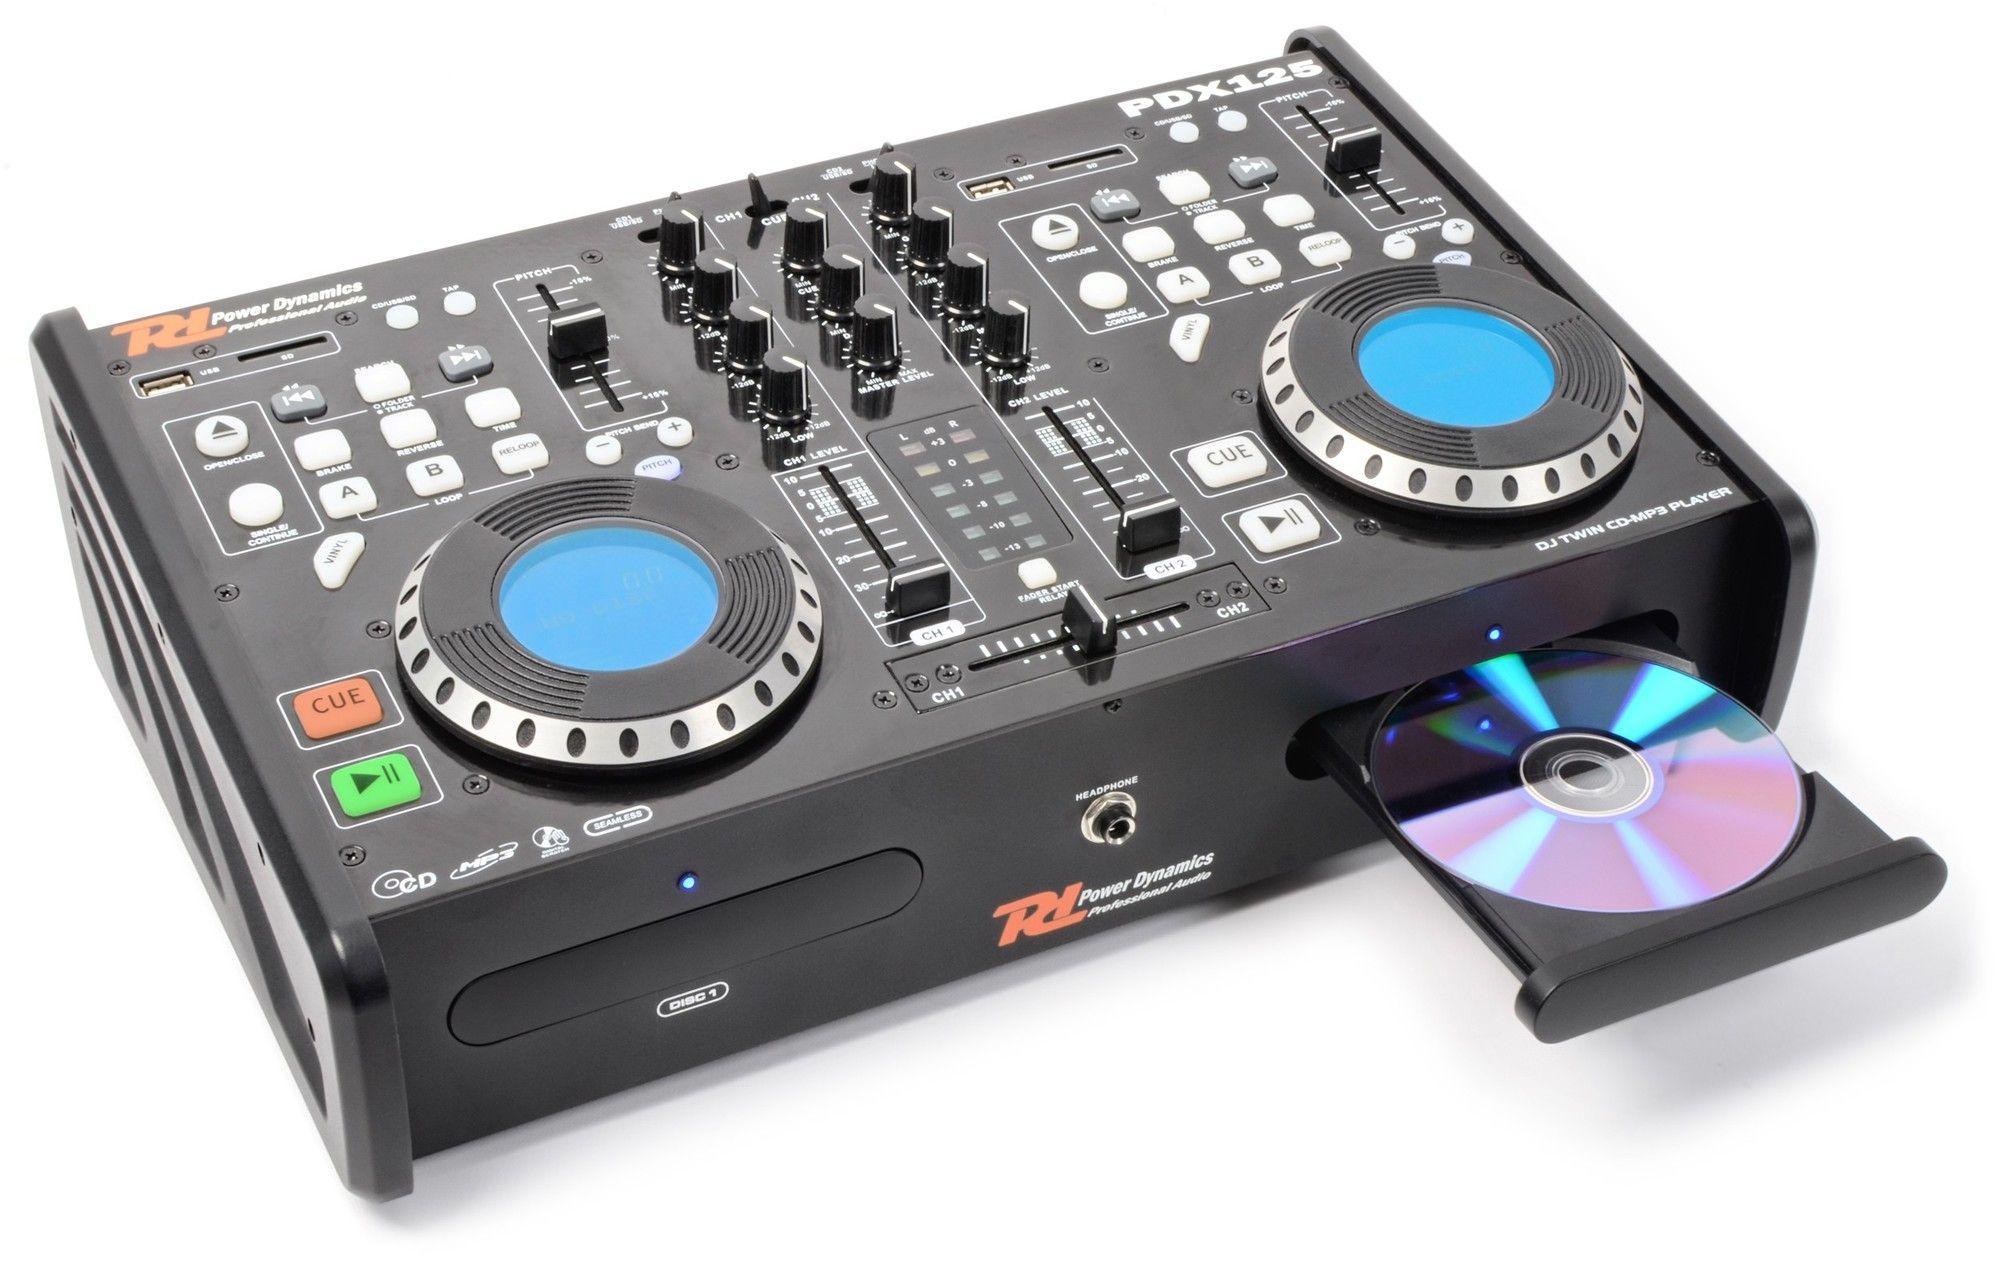 Power Dynamics PDX125 dubbele CD/USB/CD/MP3 speler en mixer